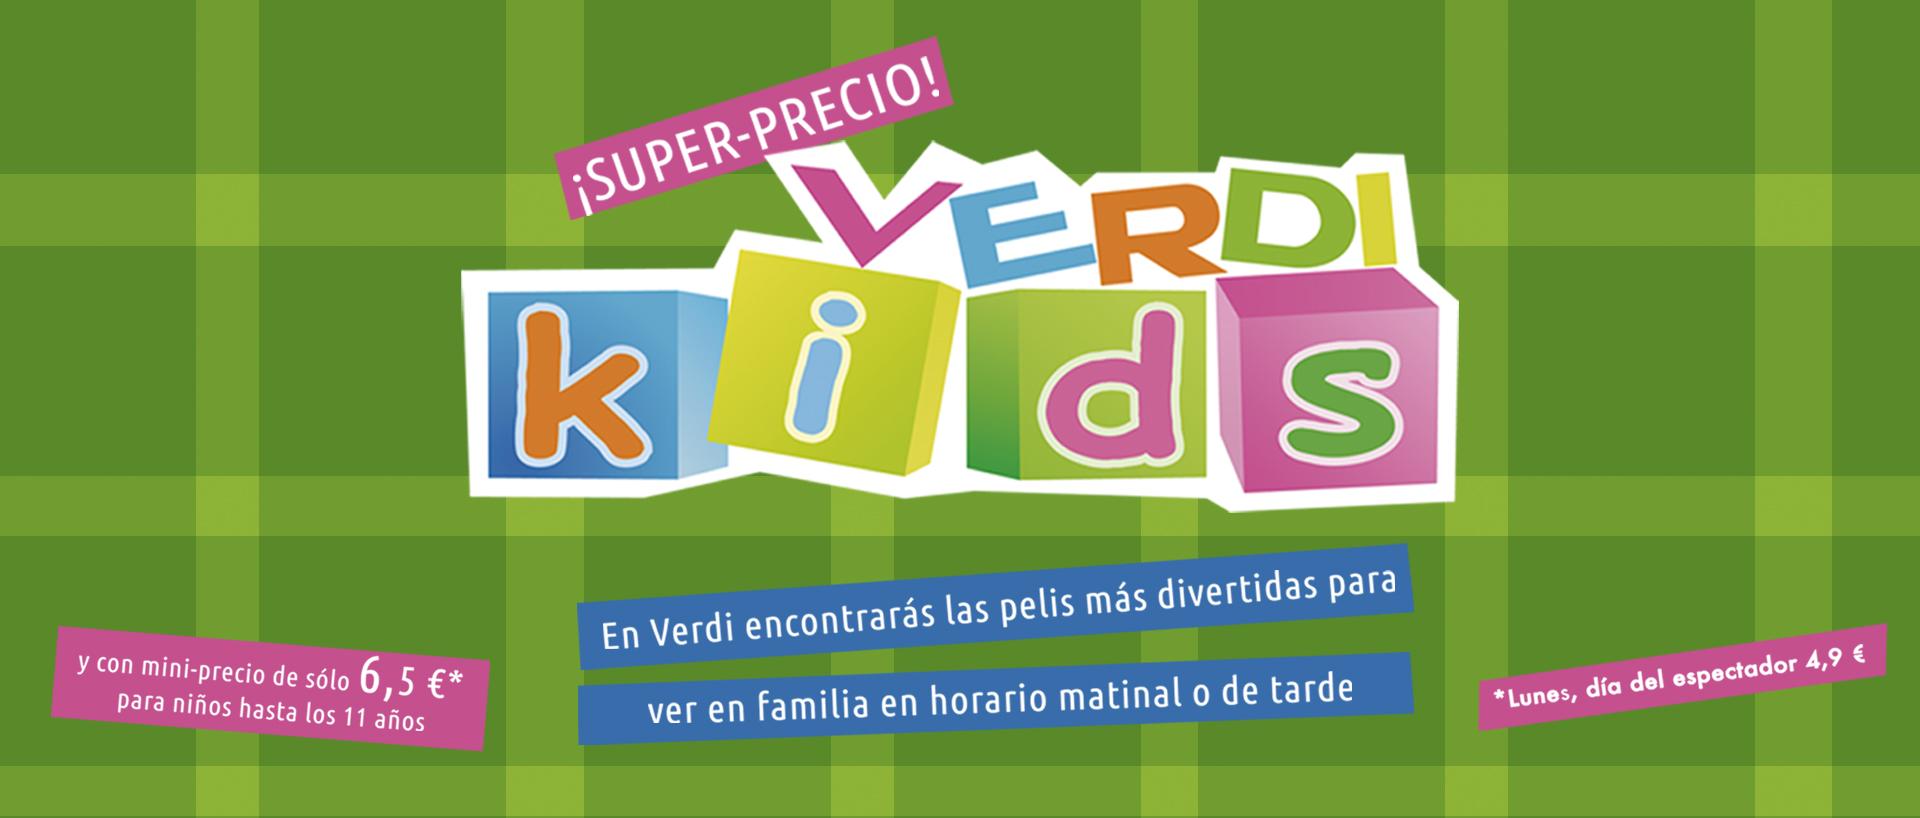 Verdi_Promos_verdi kids.jpg